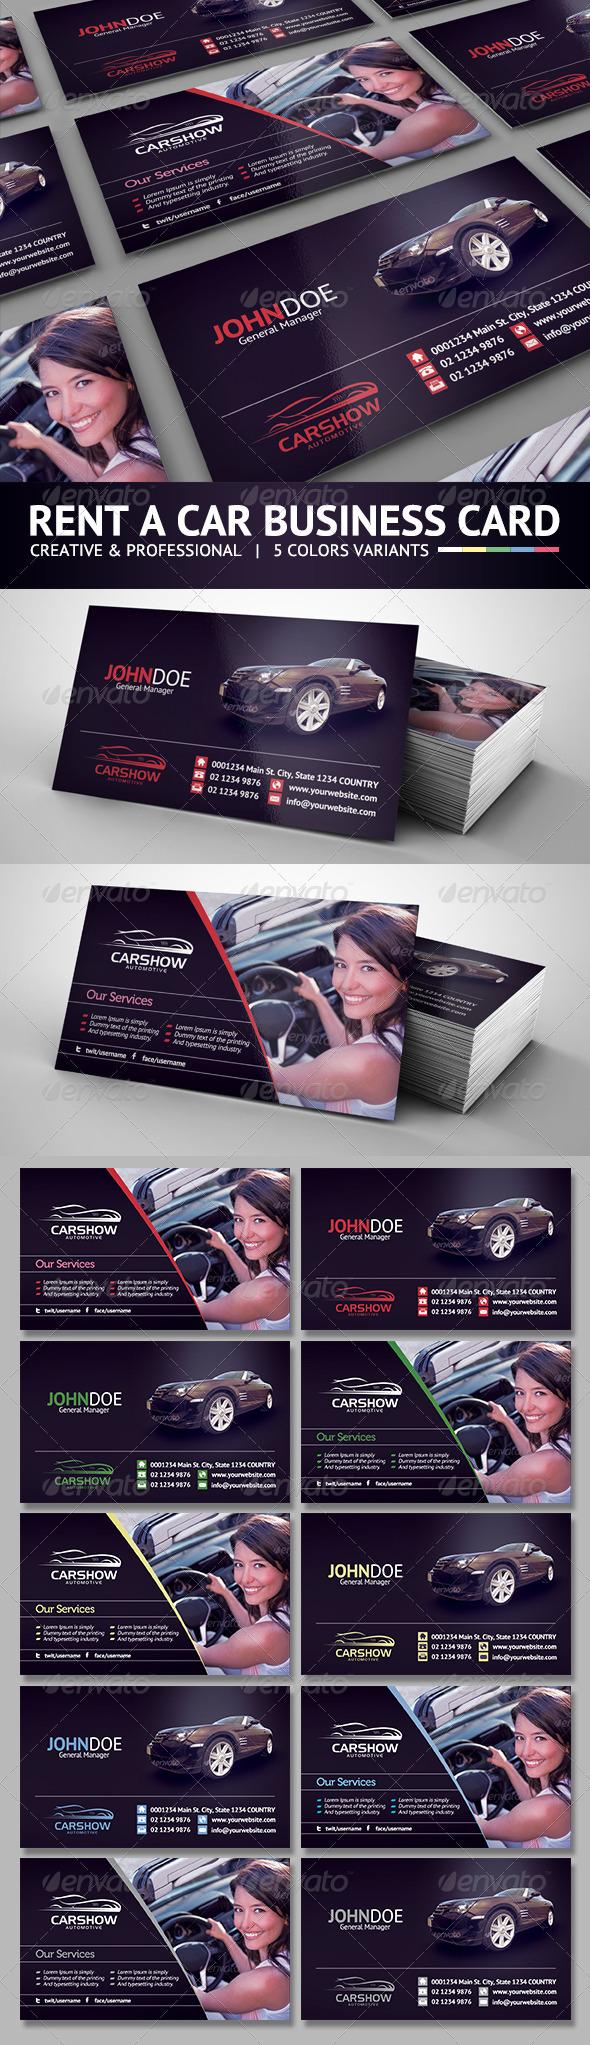 GraphicRiver Rent A Car Business Card 6076004